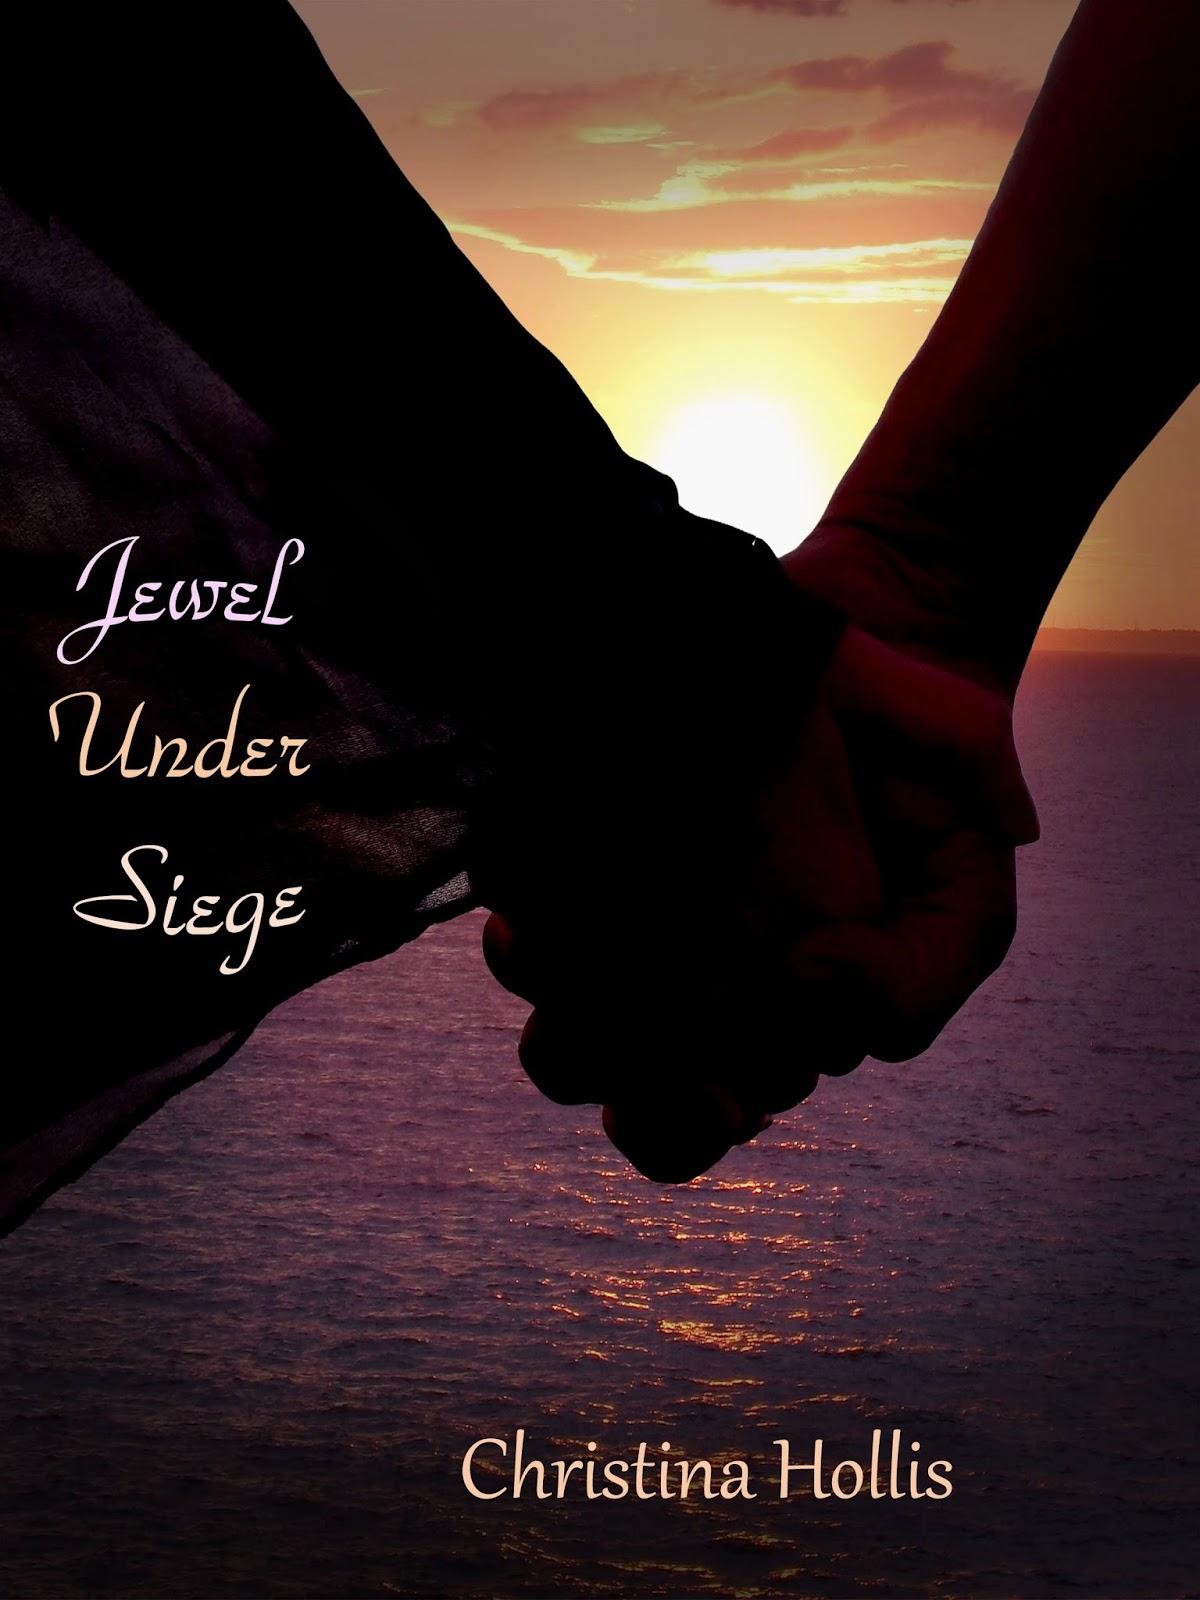 http://www.amazon.co.uk/Jewel-Under-Siege-Christina-Hollis-ebook/dp/B00IJZLM6O/ref=sr_1_1?ie=UTF8&qid=1396339351&sr=8-1&keywords=Jewel+Under+Siege